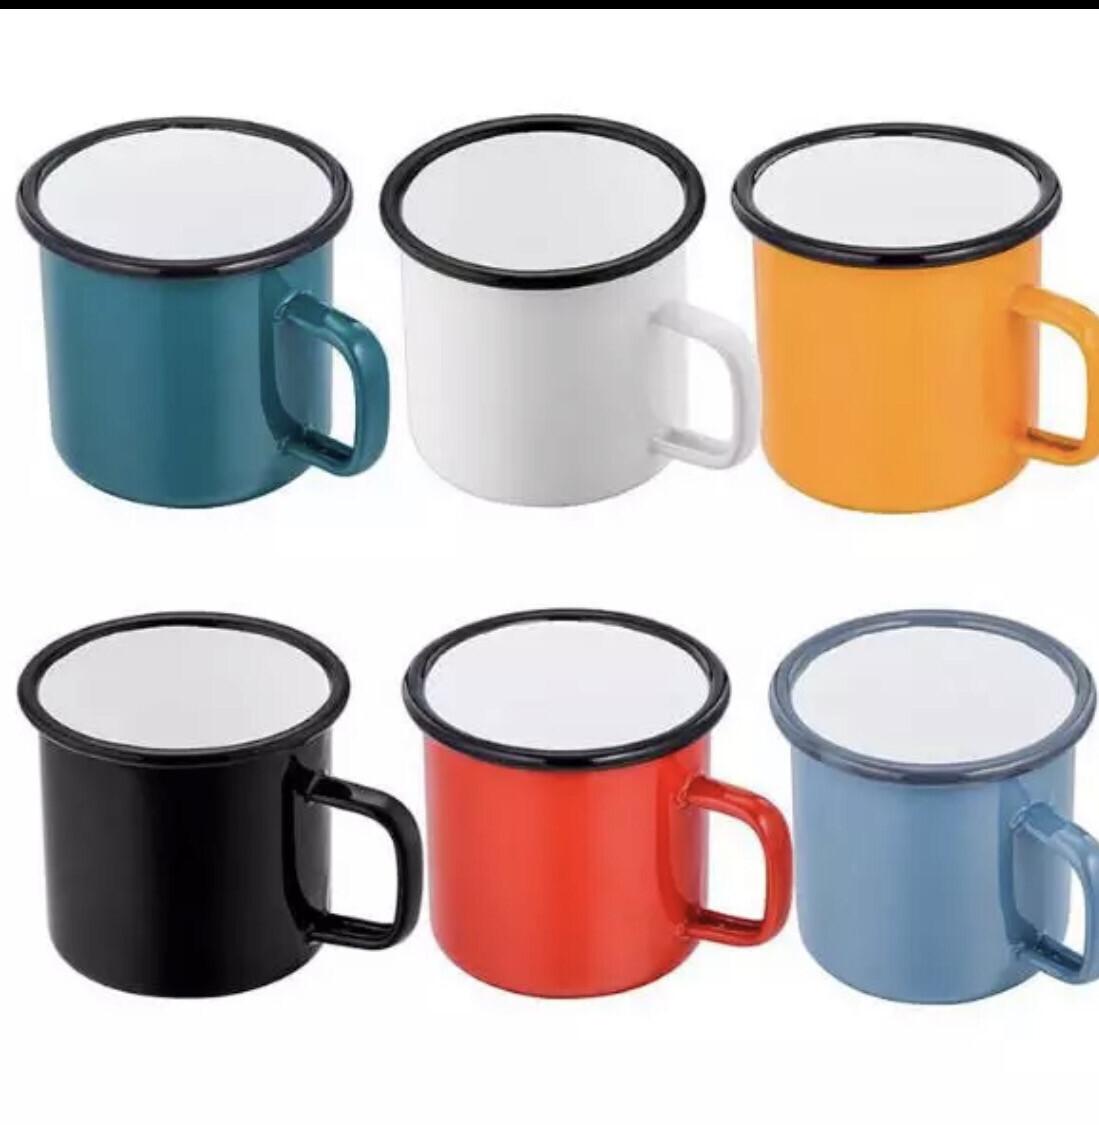 Enamel Mug Colored Camping Mug